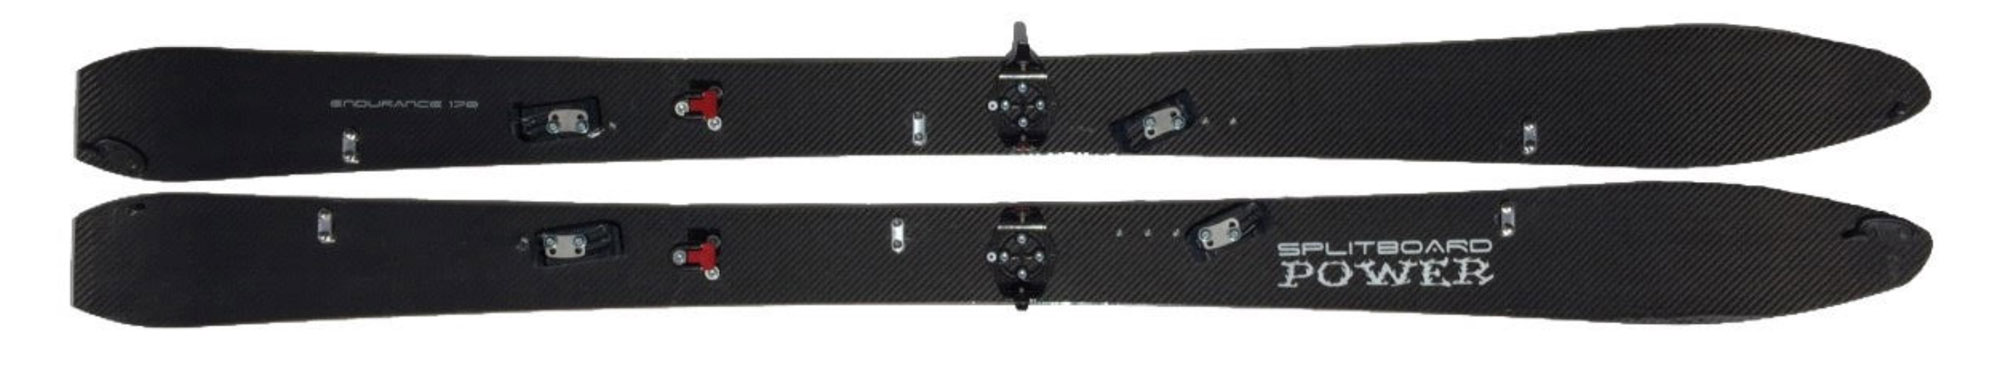 splitboard power endurance 170